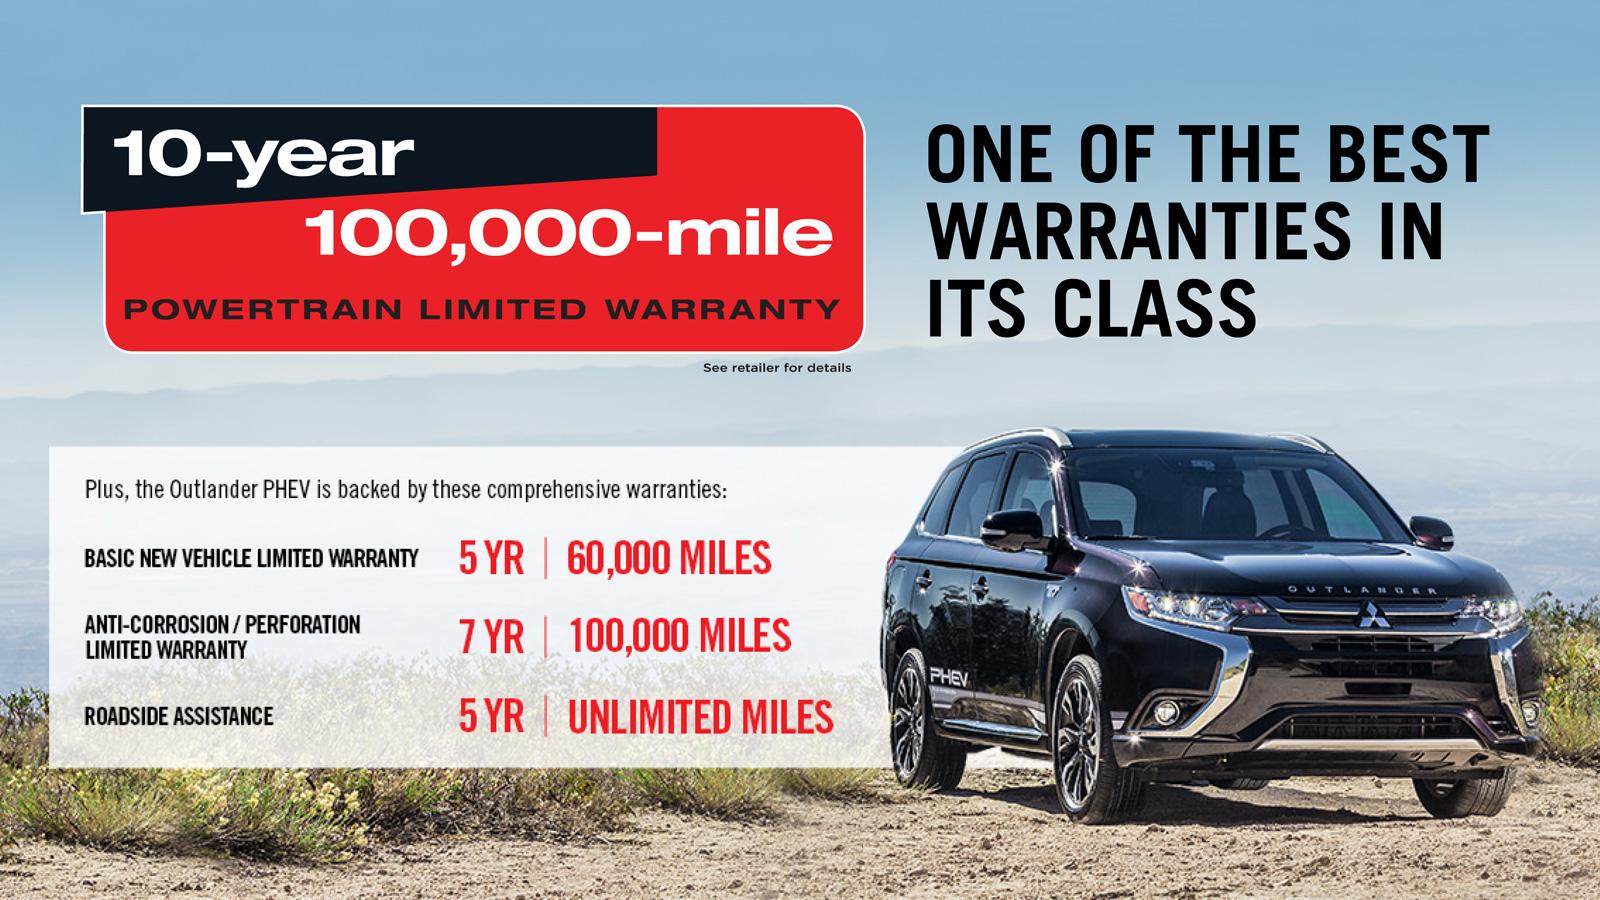 Mitsubishi bumper to bumper warranty